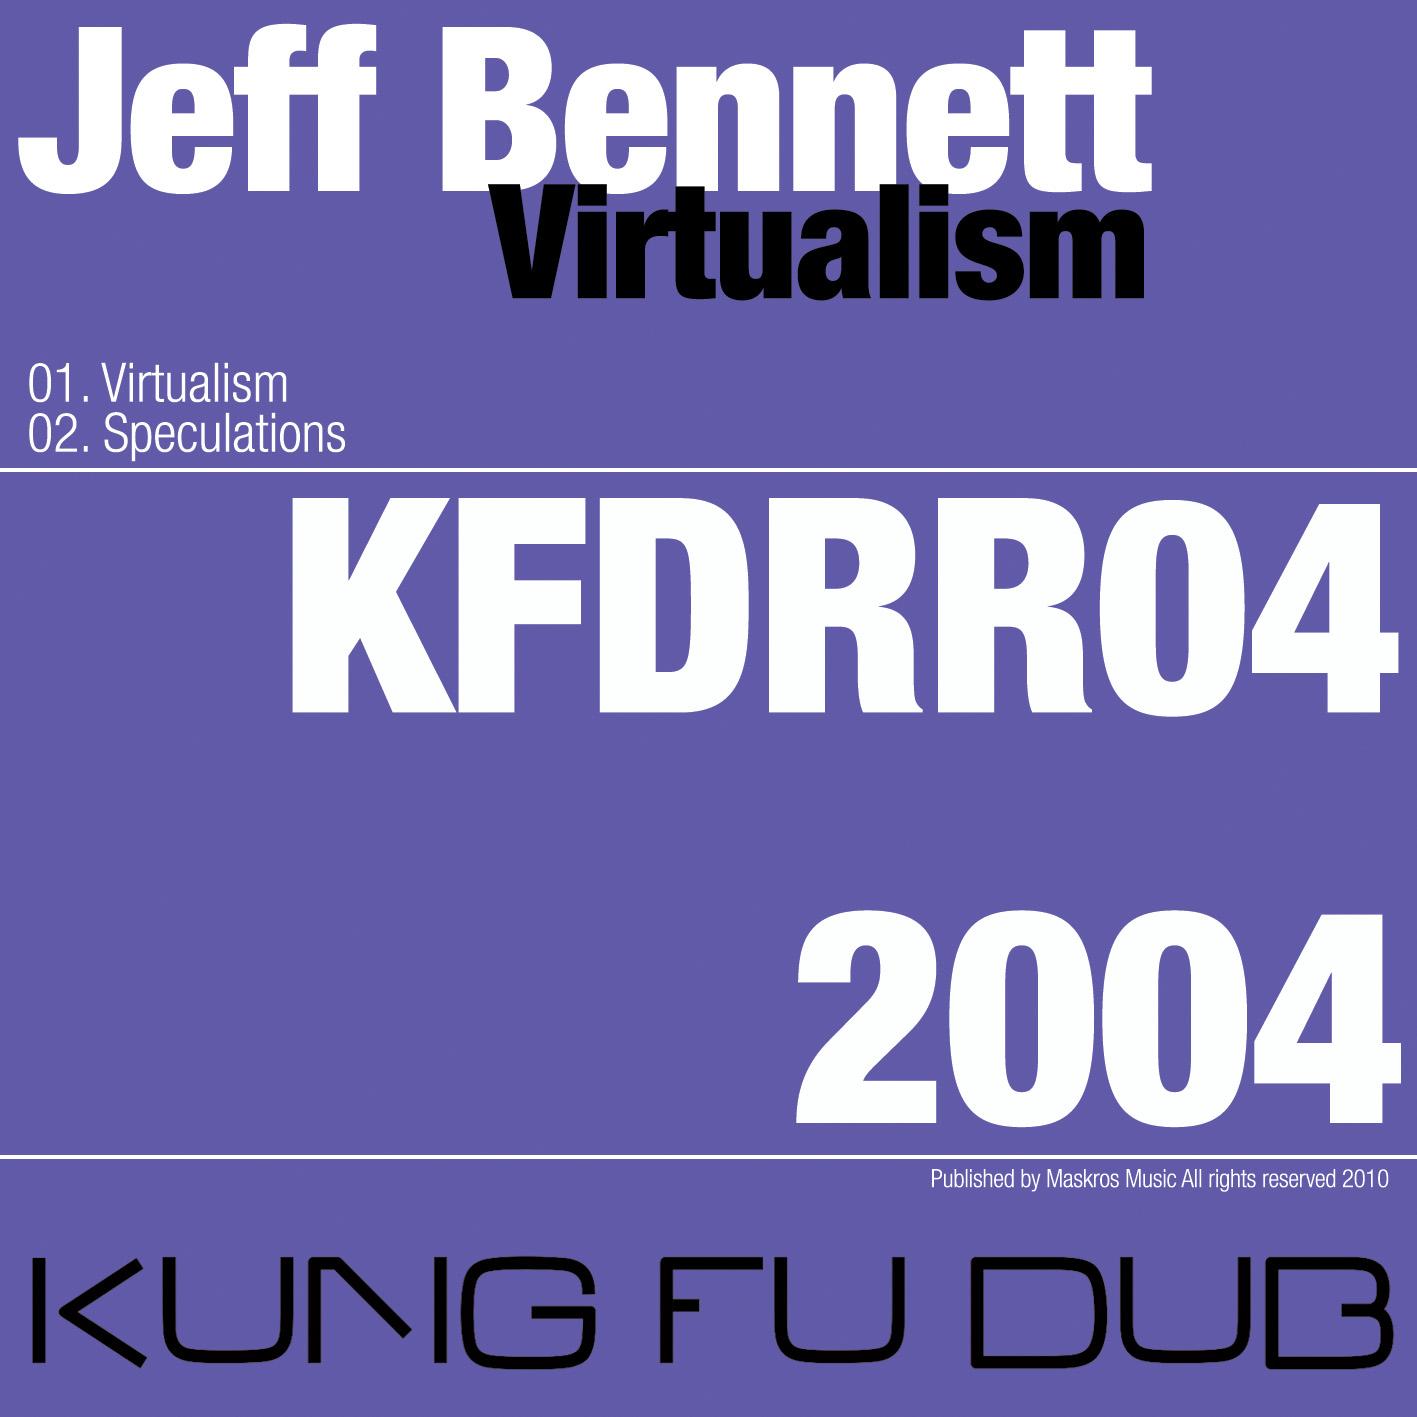 Jeff Bennett – Virtualism – Kung Fu Dub Rec